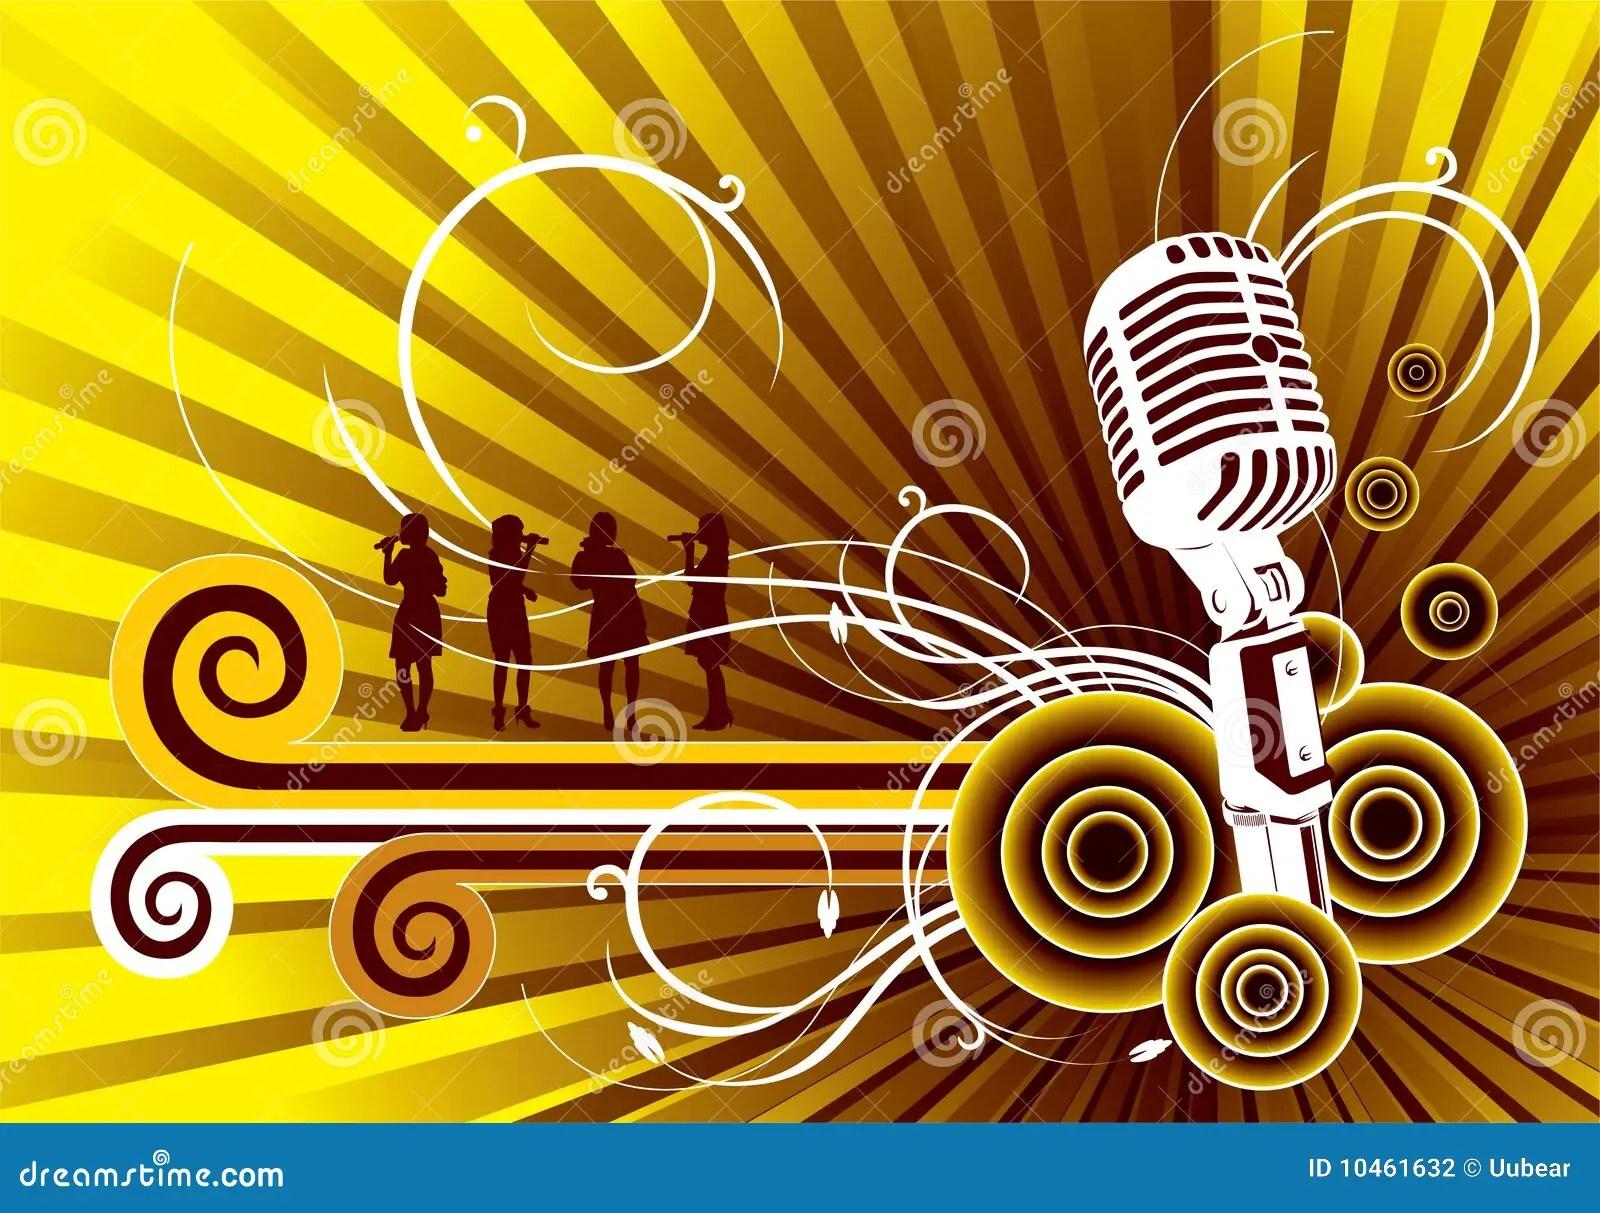 Grunge Girl Wallpaper Golden Music Background Stock Photography Image 10461632